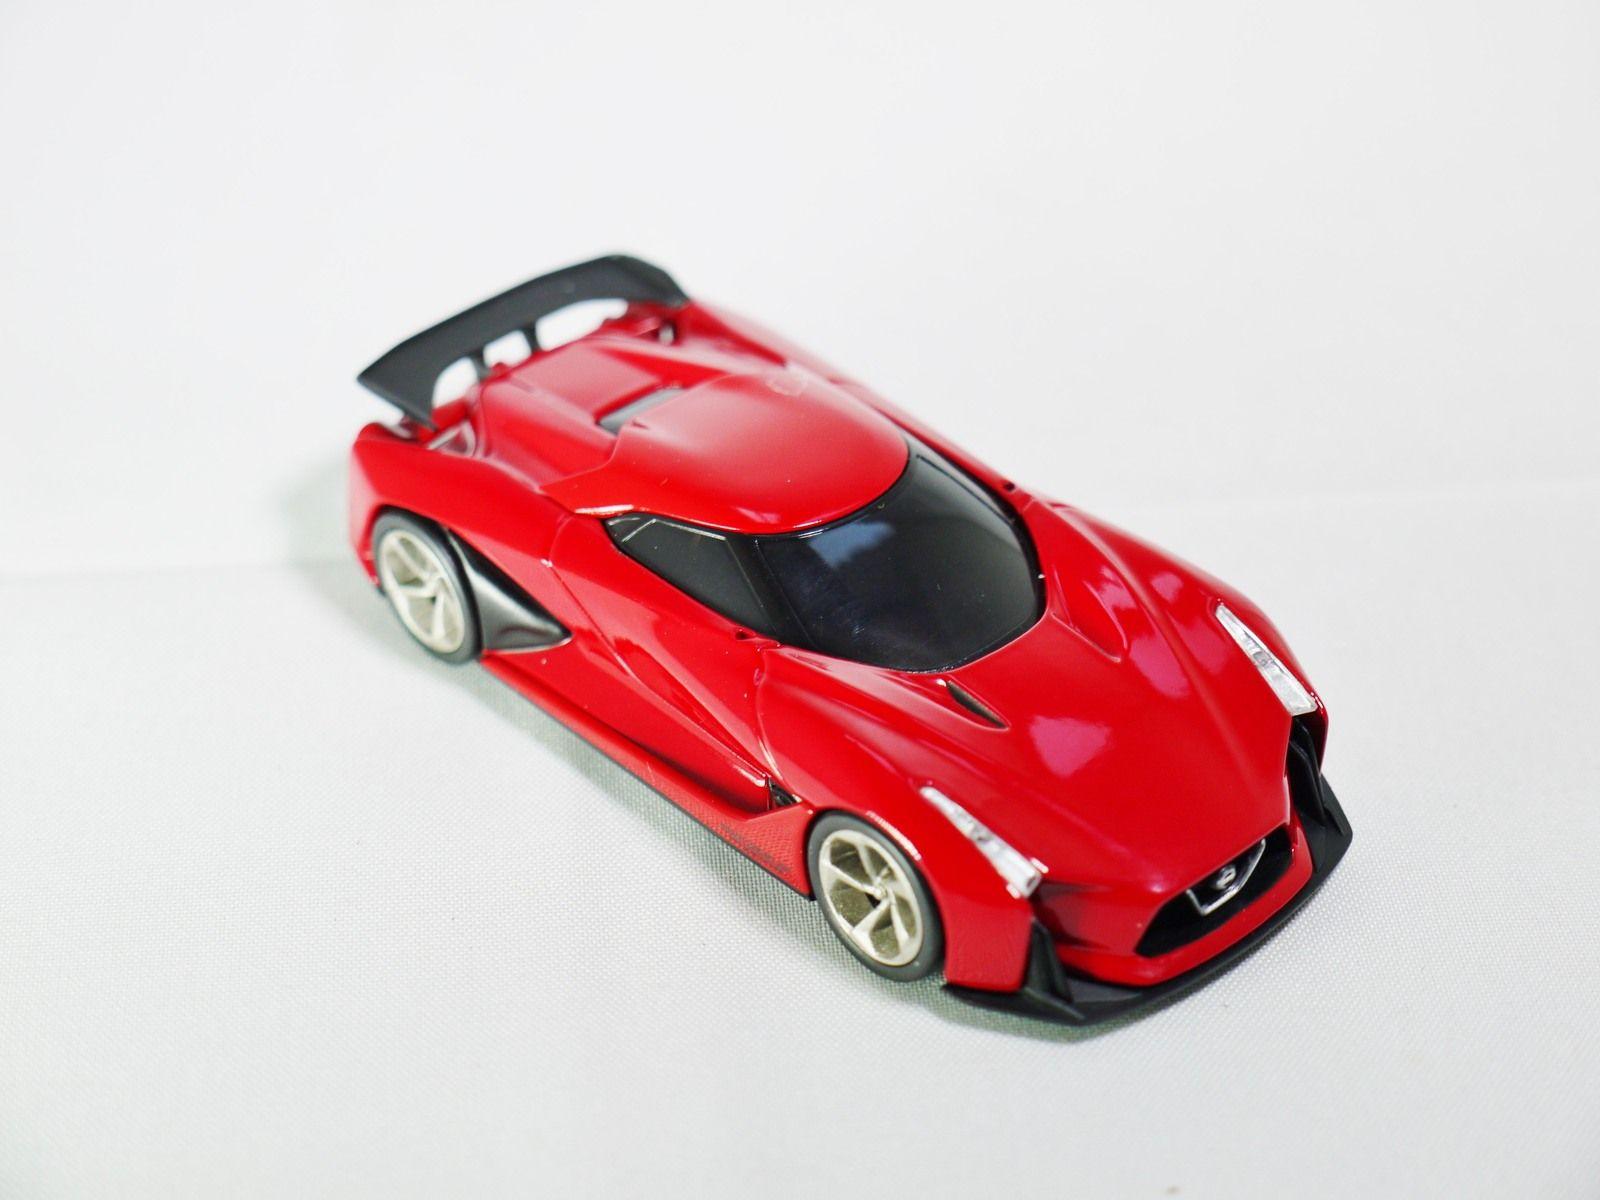 Tomica Tomytec Vintage Neo Gt Nissan Concept 2020 Vision Gran Turismo Red Street Cars Tomytec Nissan